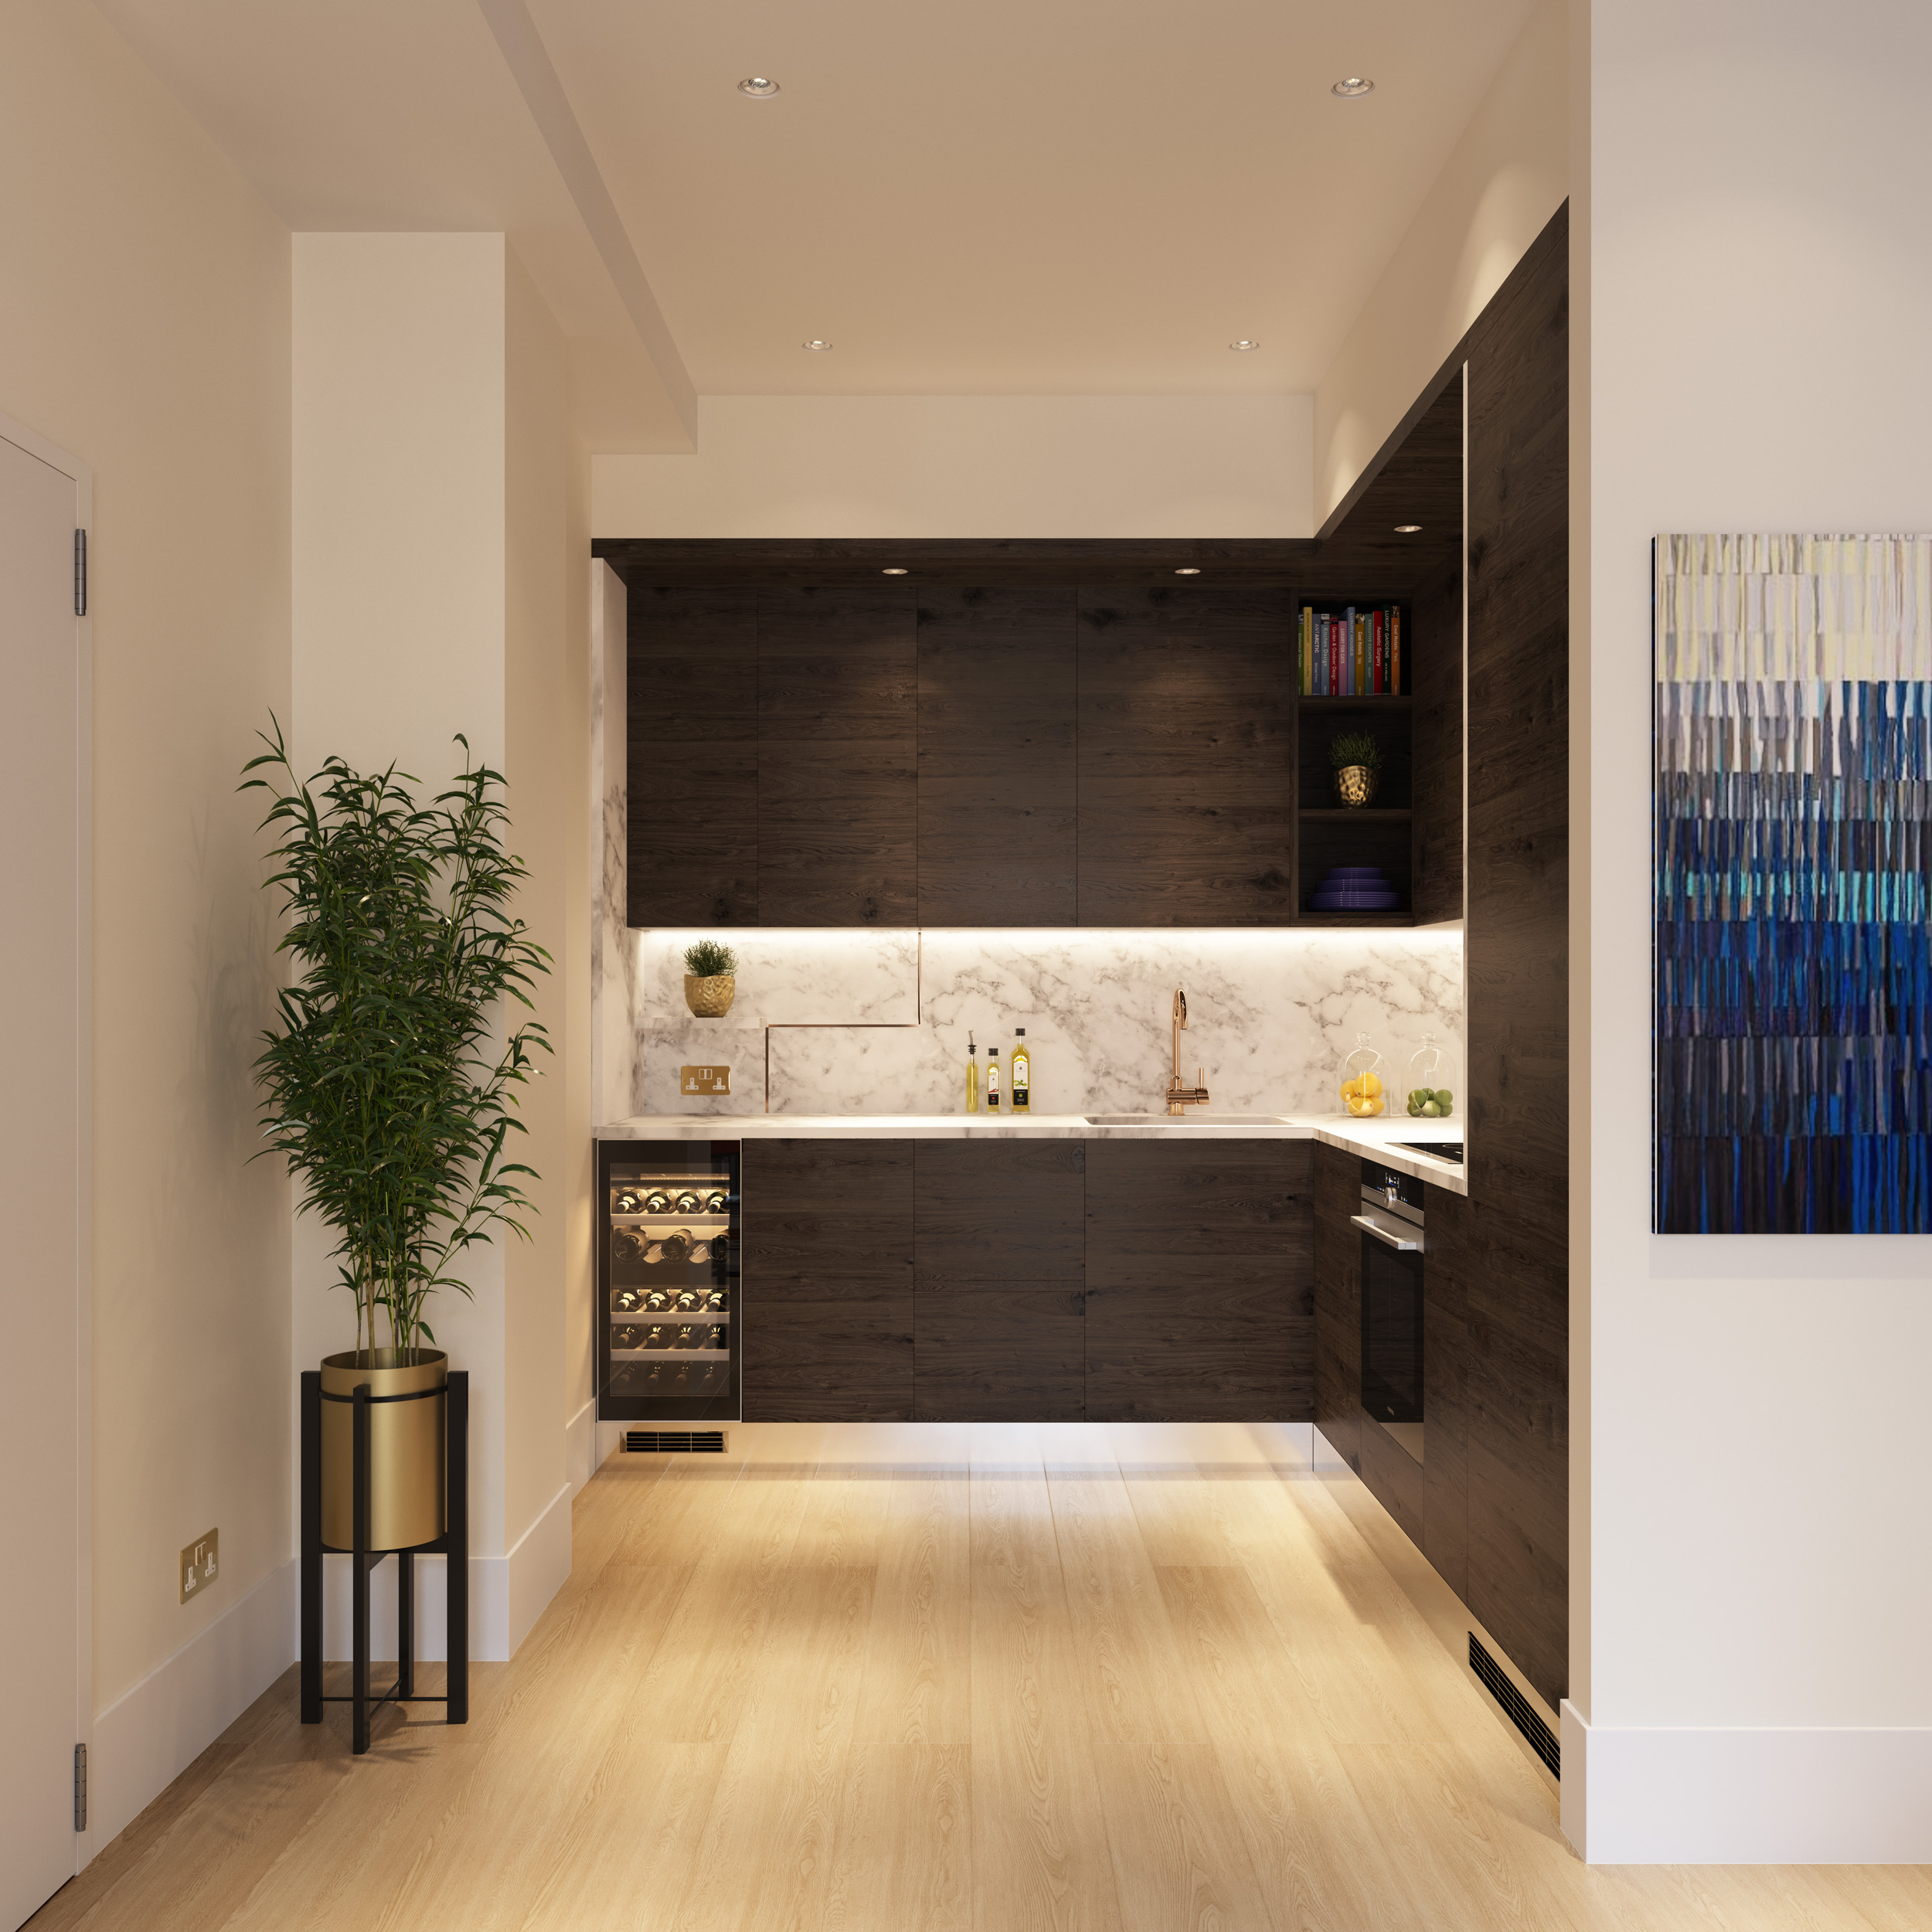 Block_A_kitchen_Final-Image_2.5k.jpg